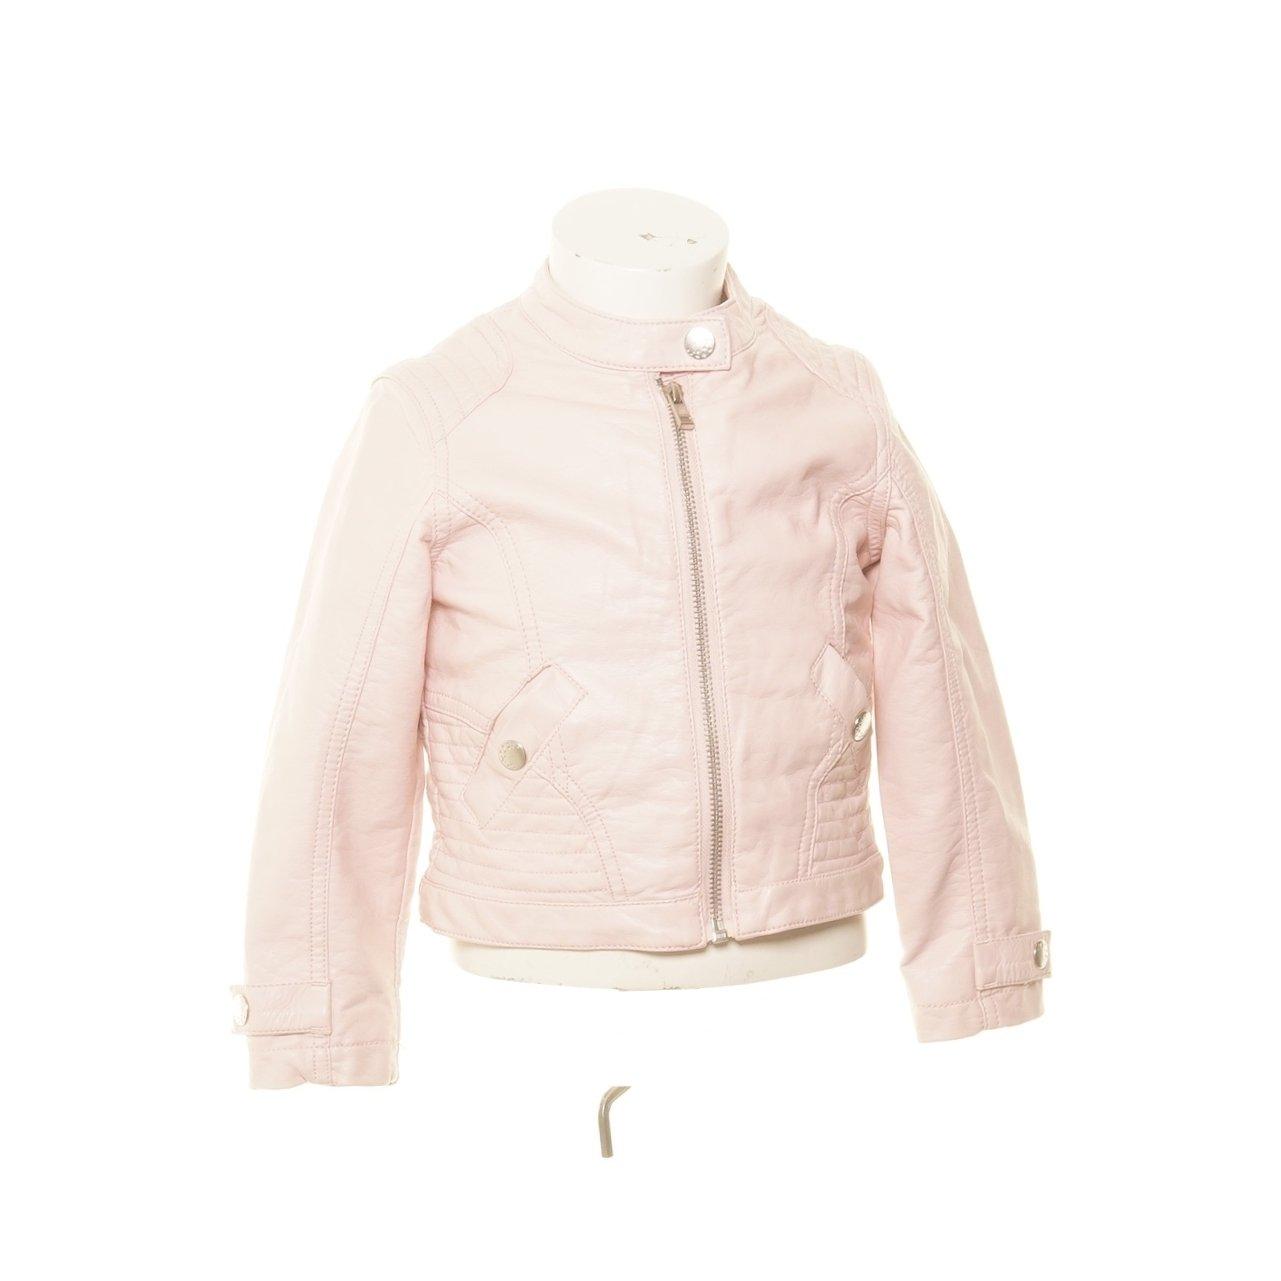 Out Wear By Lindex, Skinnjacka, Strl: 98, Rosa (366381648